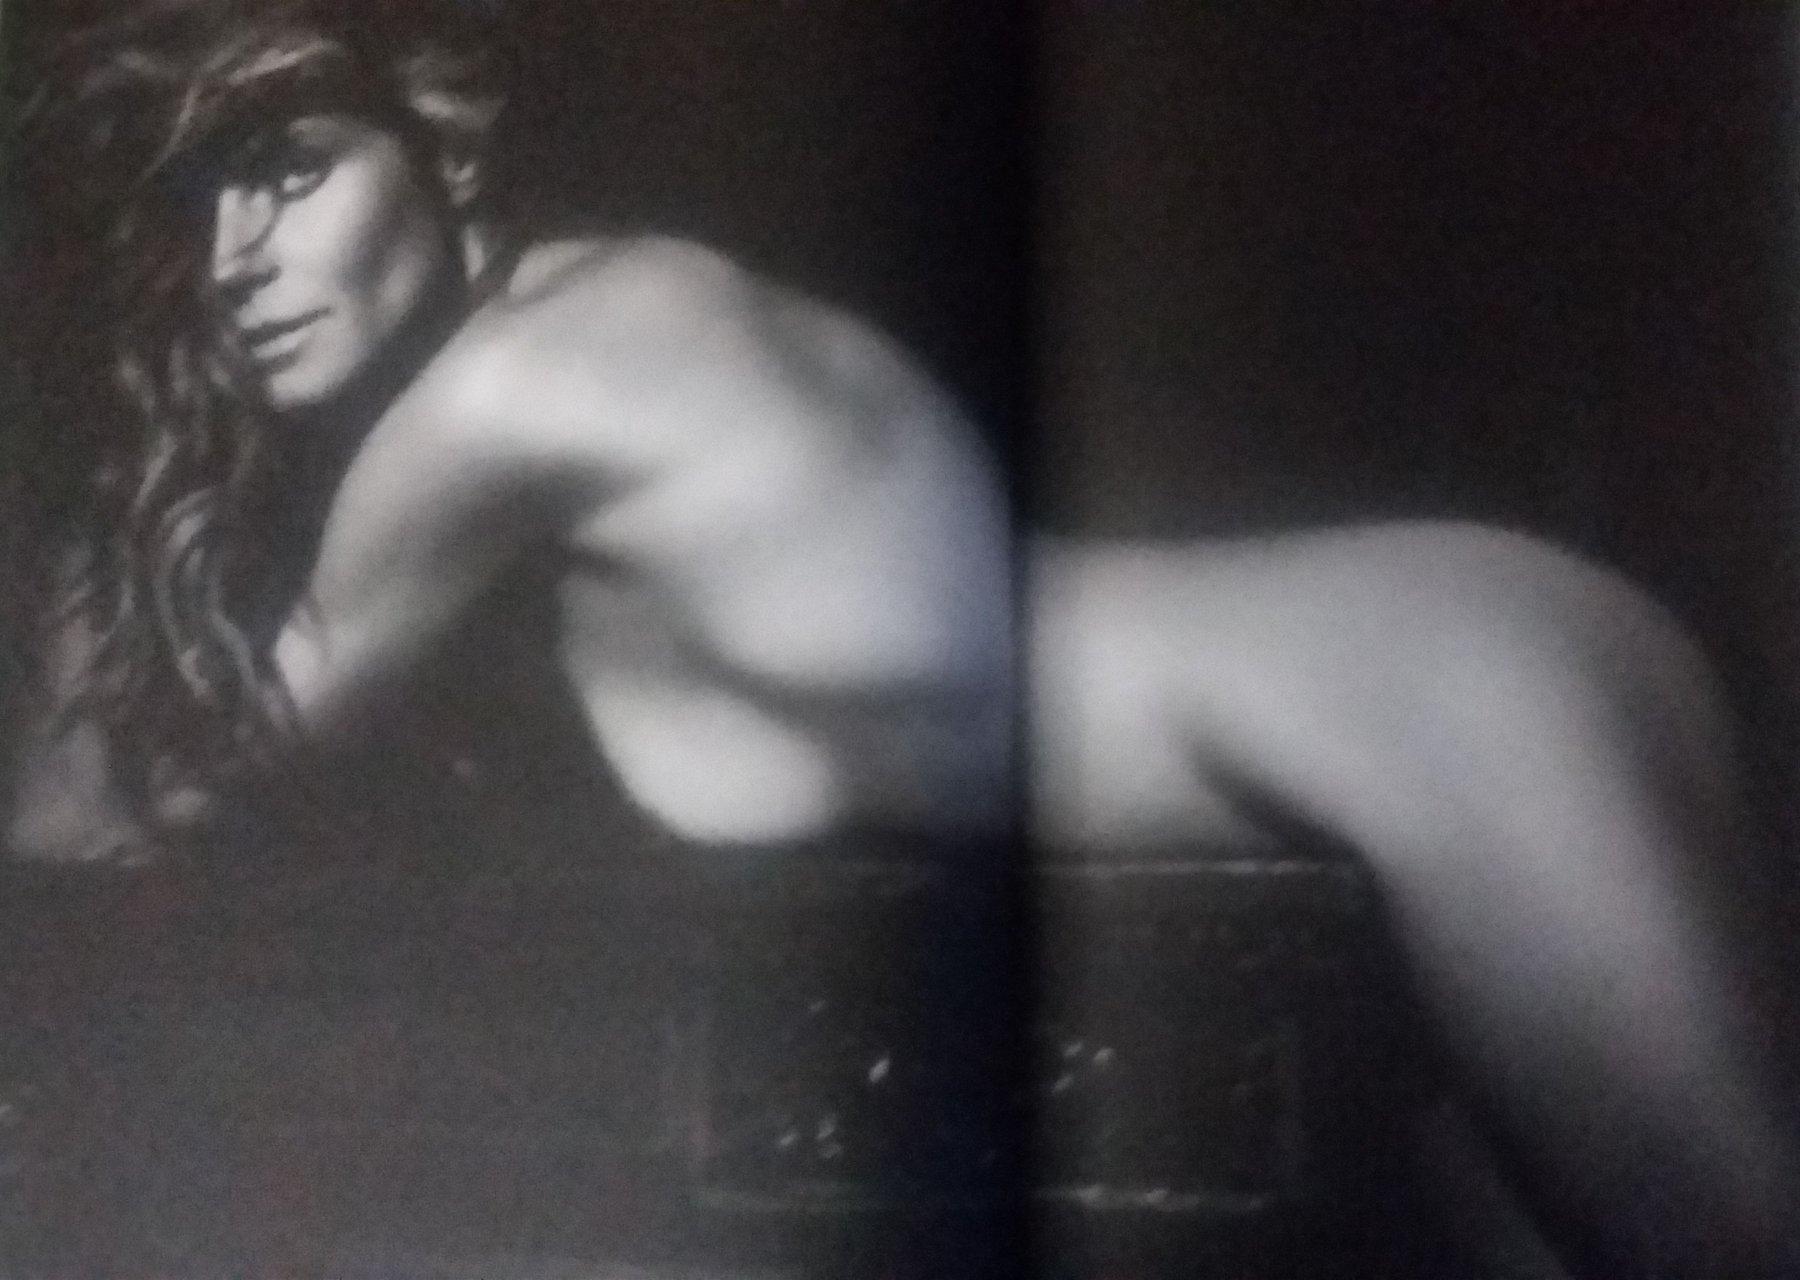 Heidi Klum Nude 36 Photos Thefappening